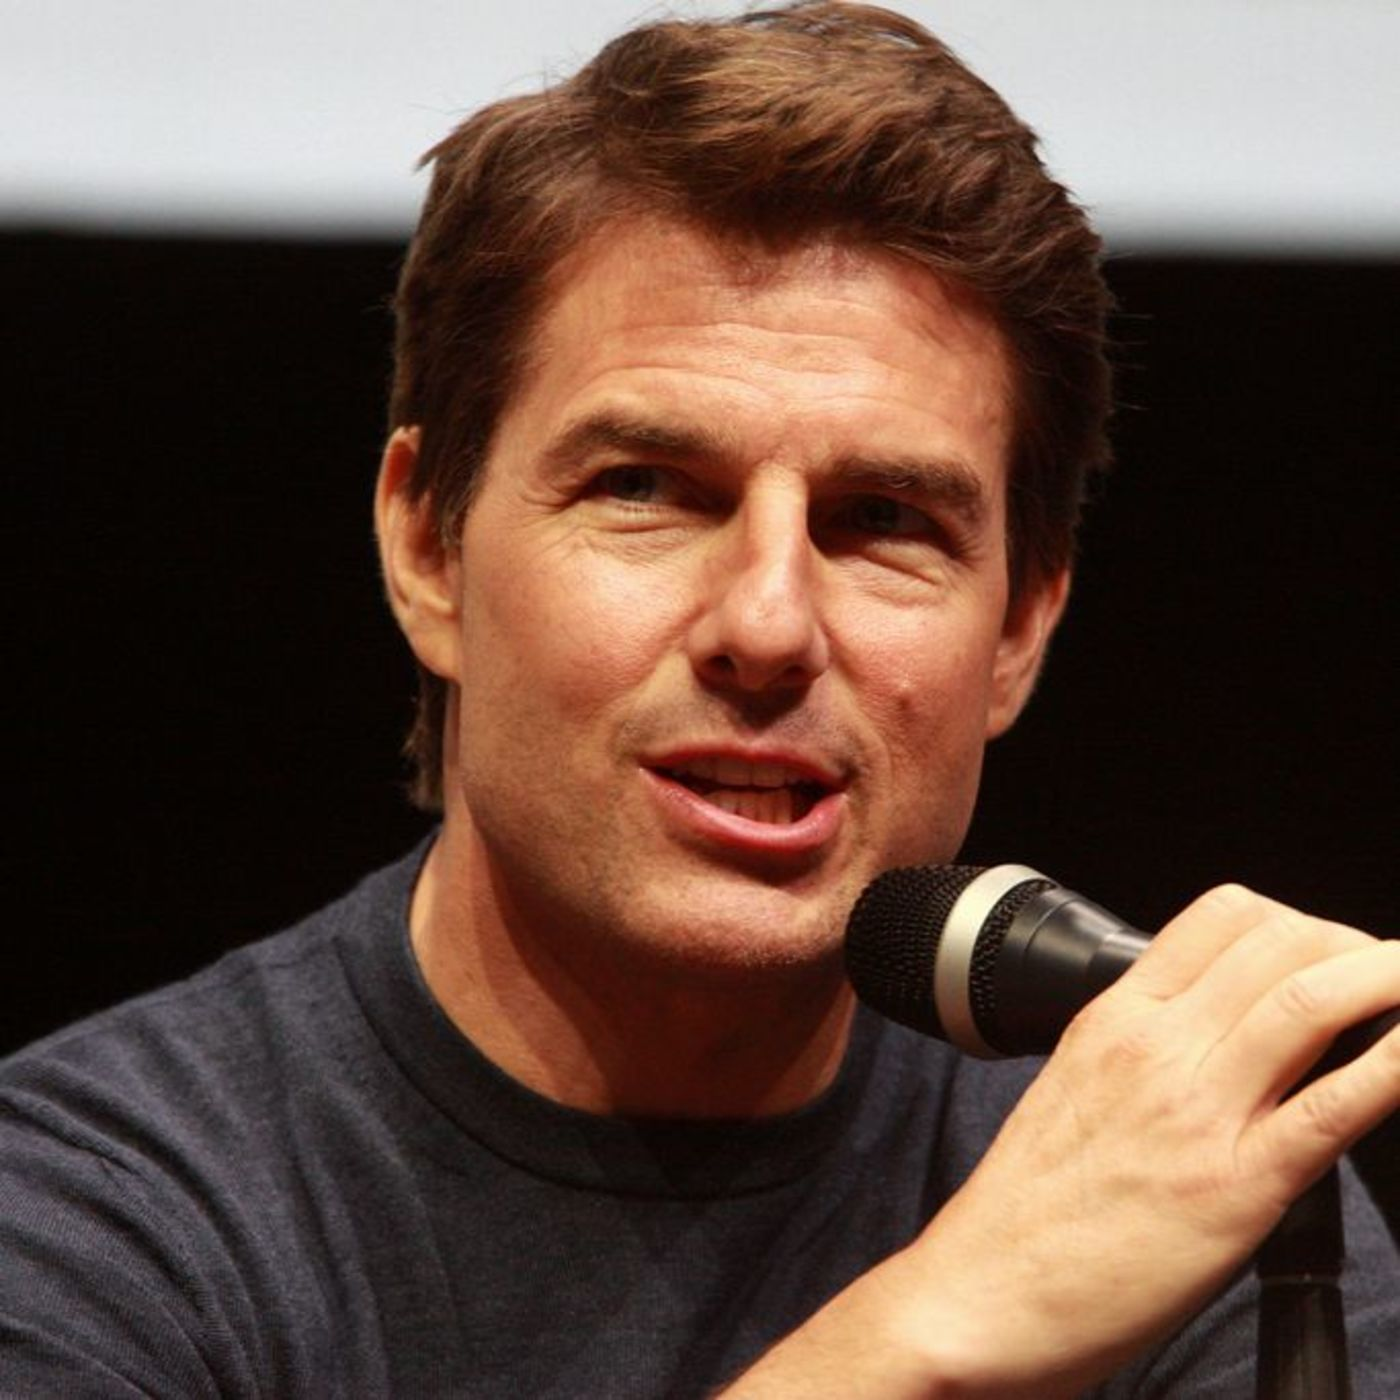 Tom Cruise - Portrait